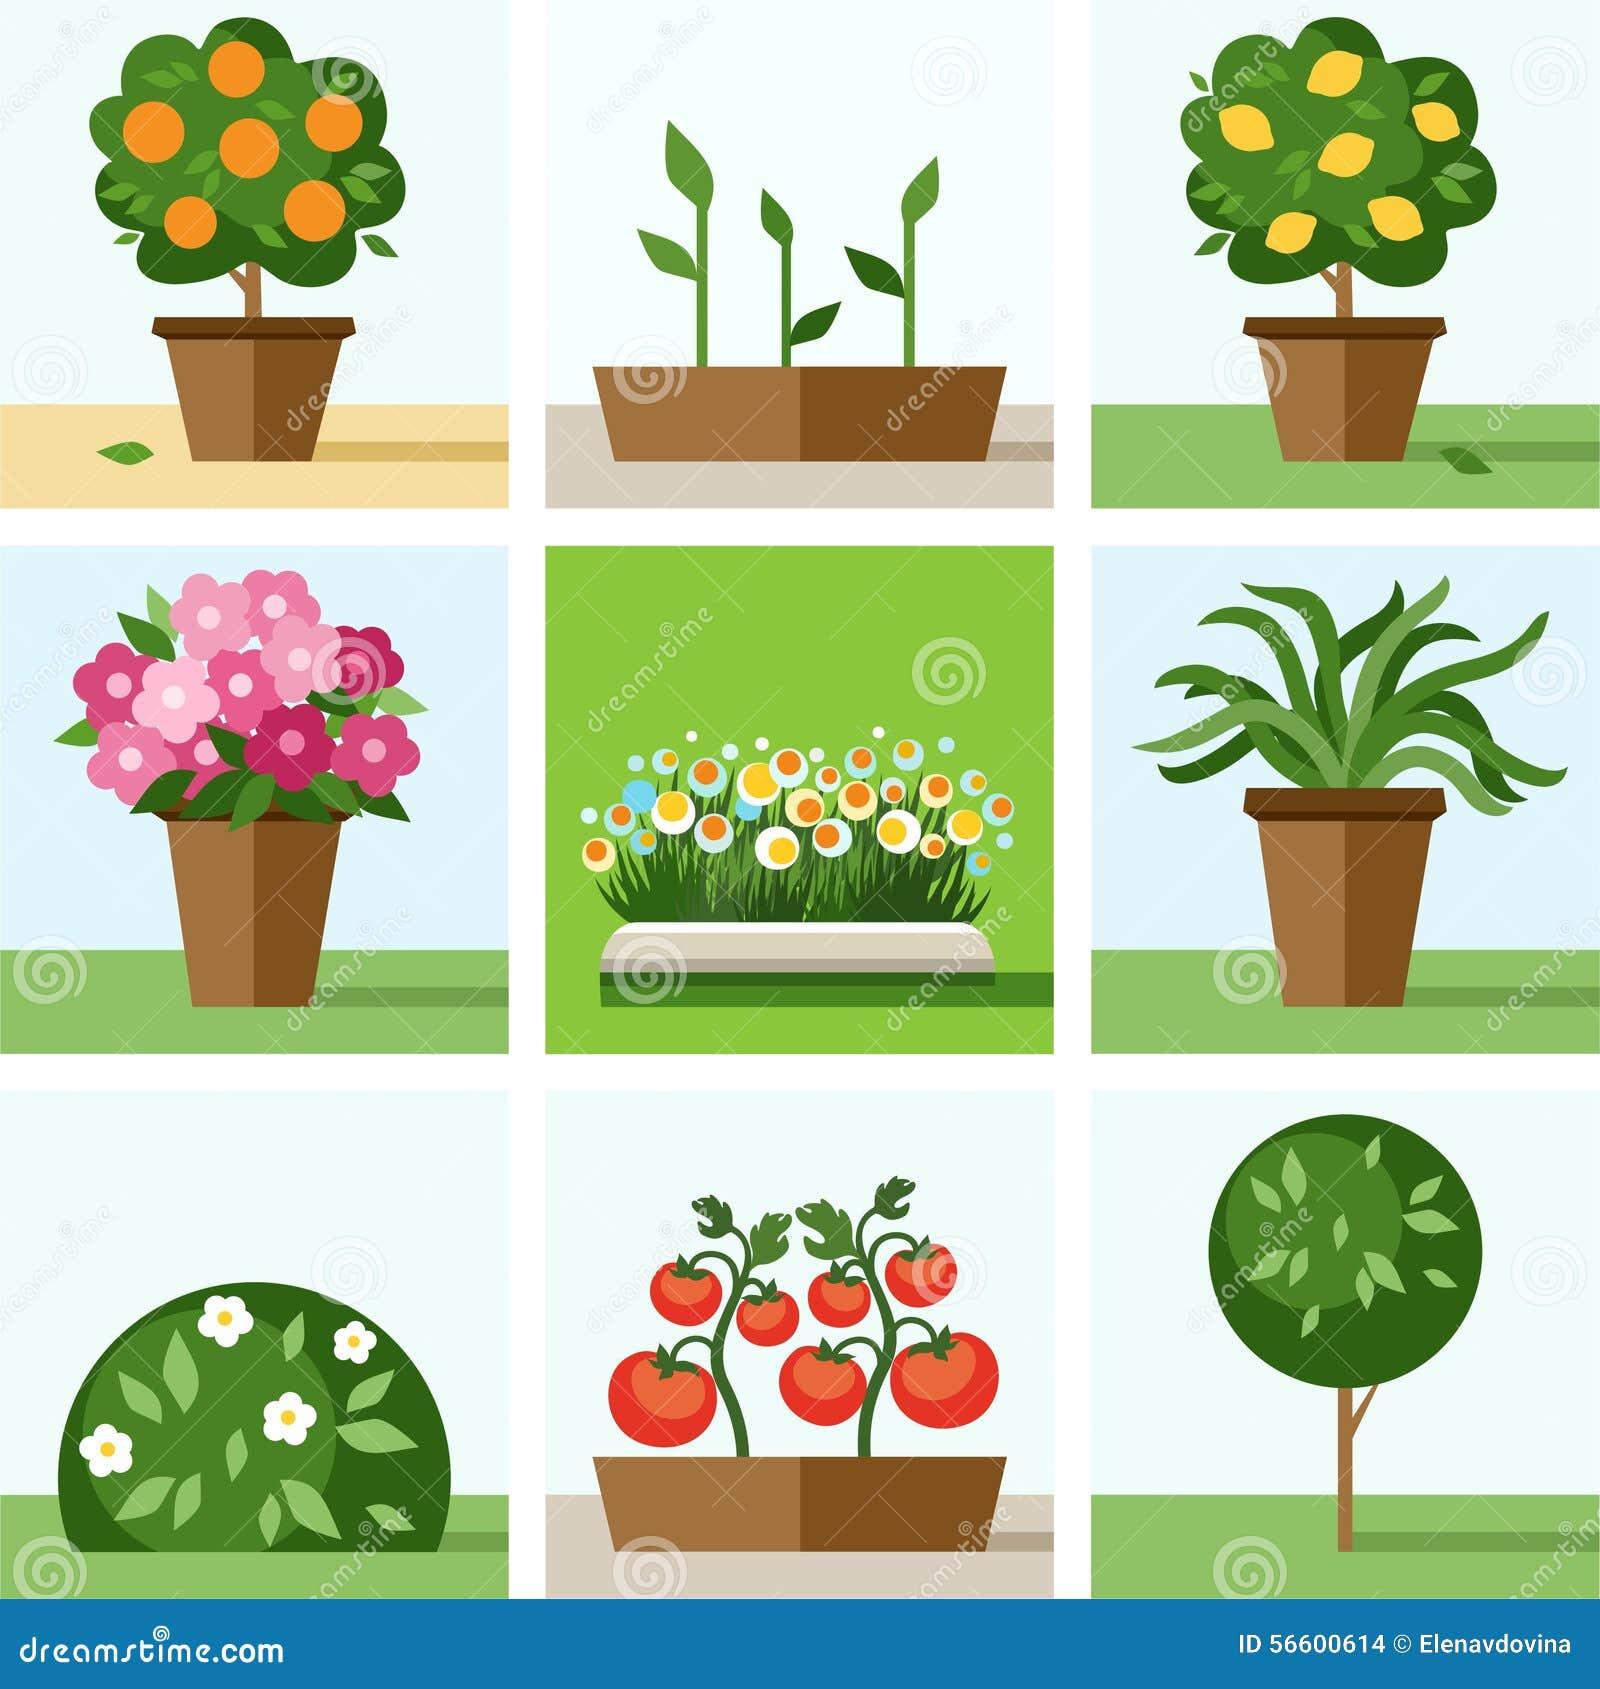 Download Garden, Vegetable Garden, Flowers, Trees, Shrubs, Flower Beds,  Icons